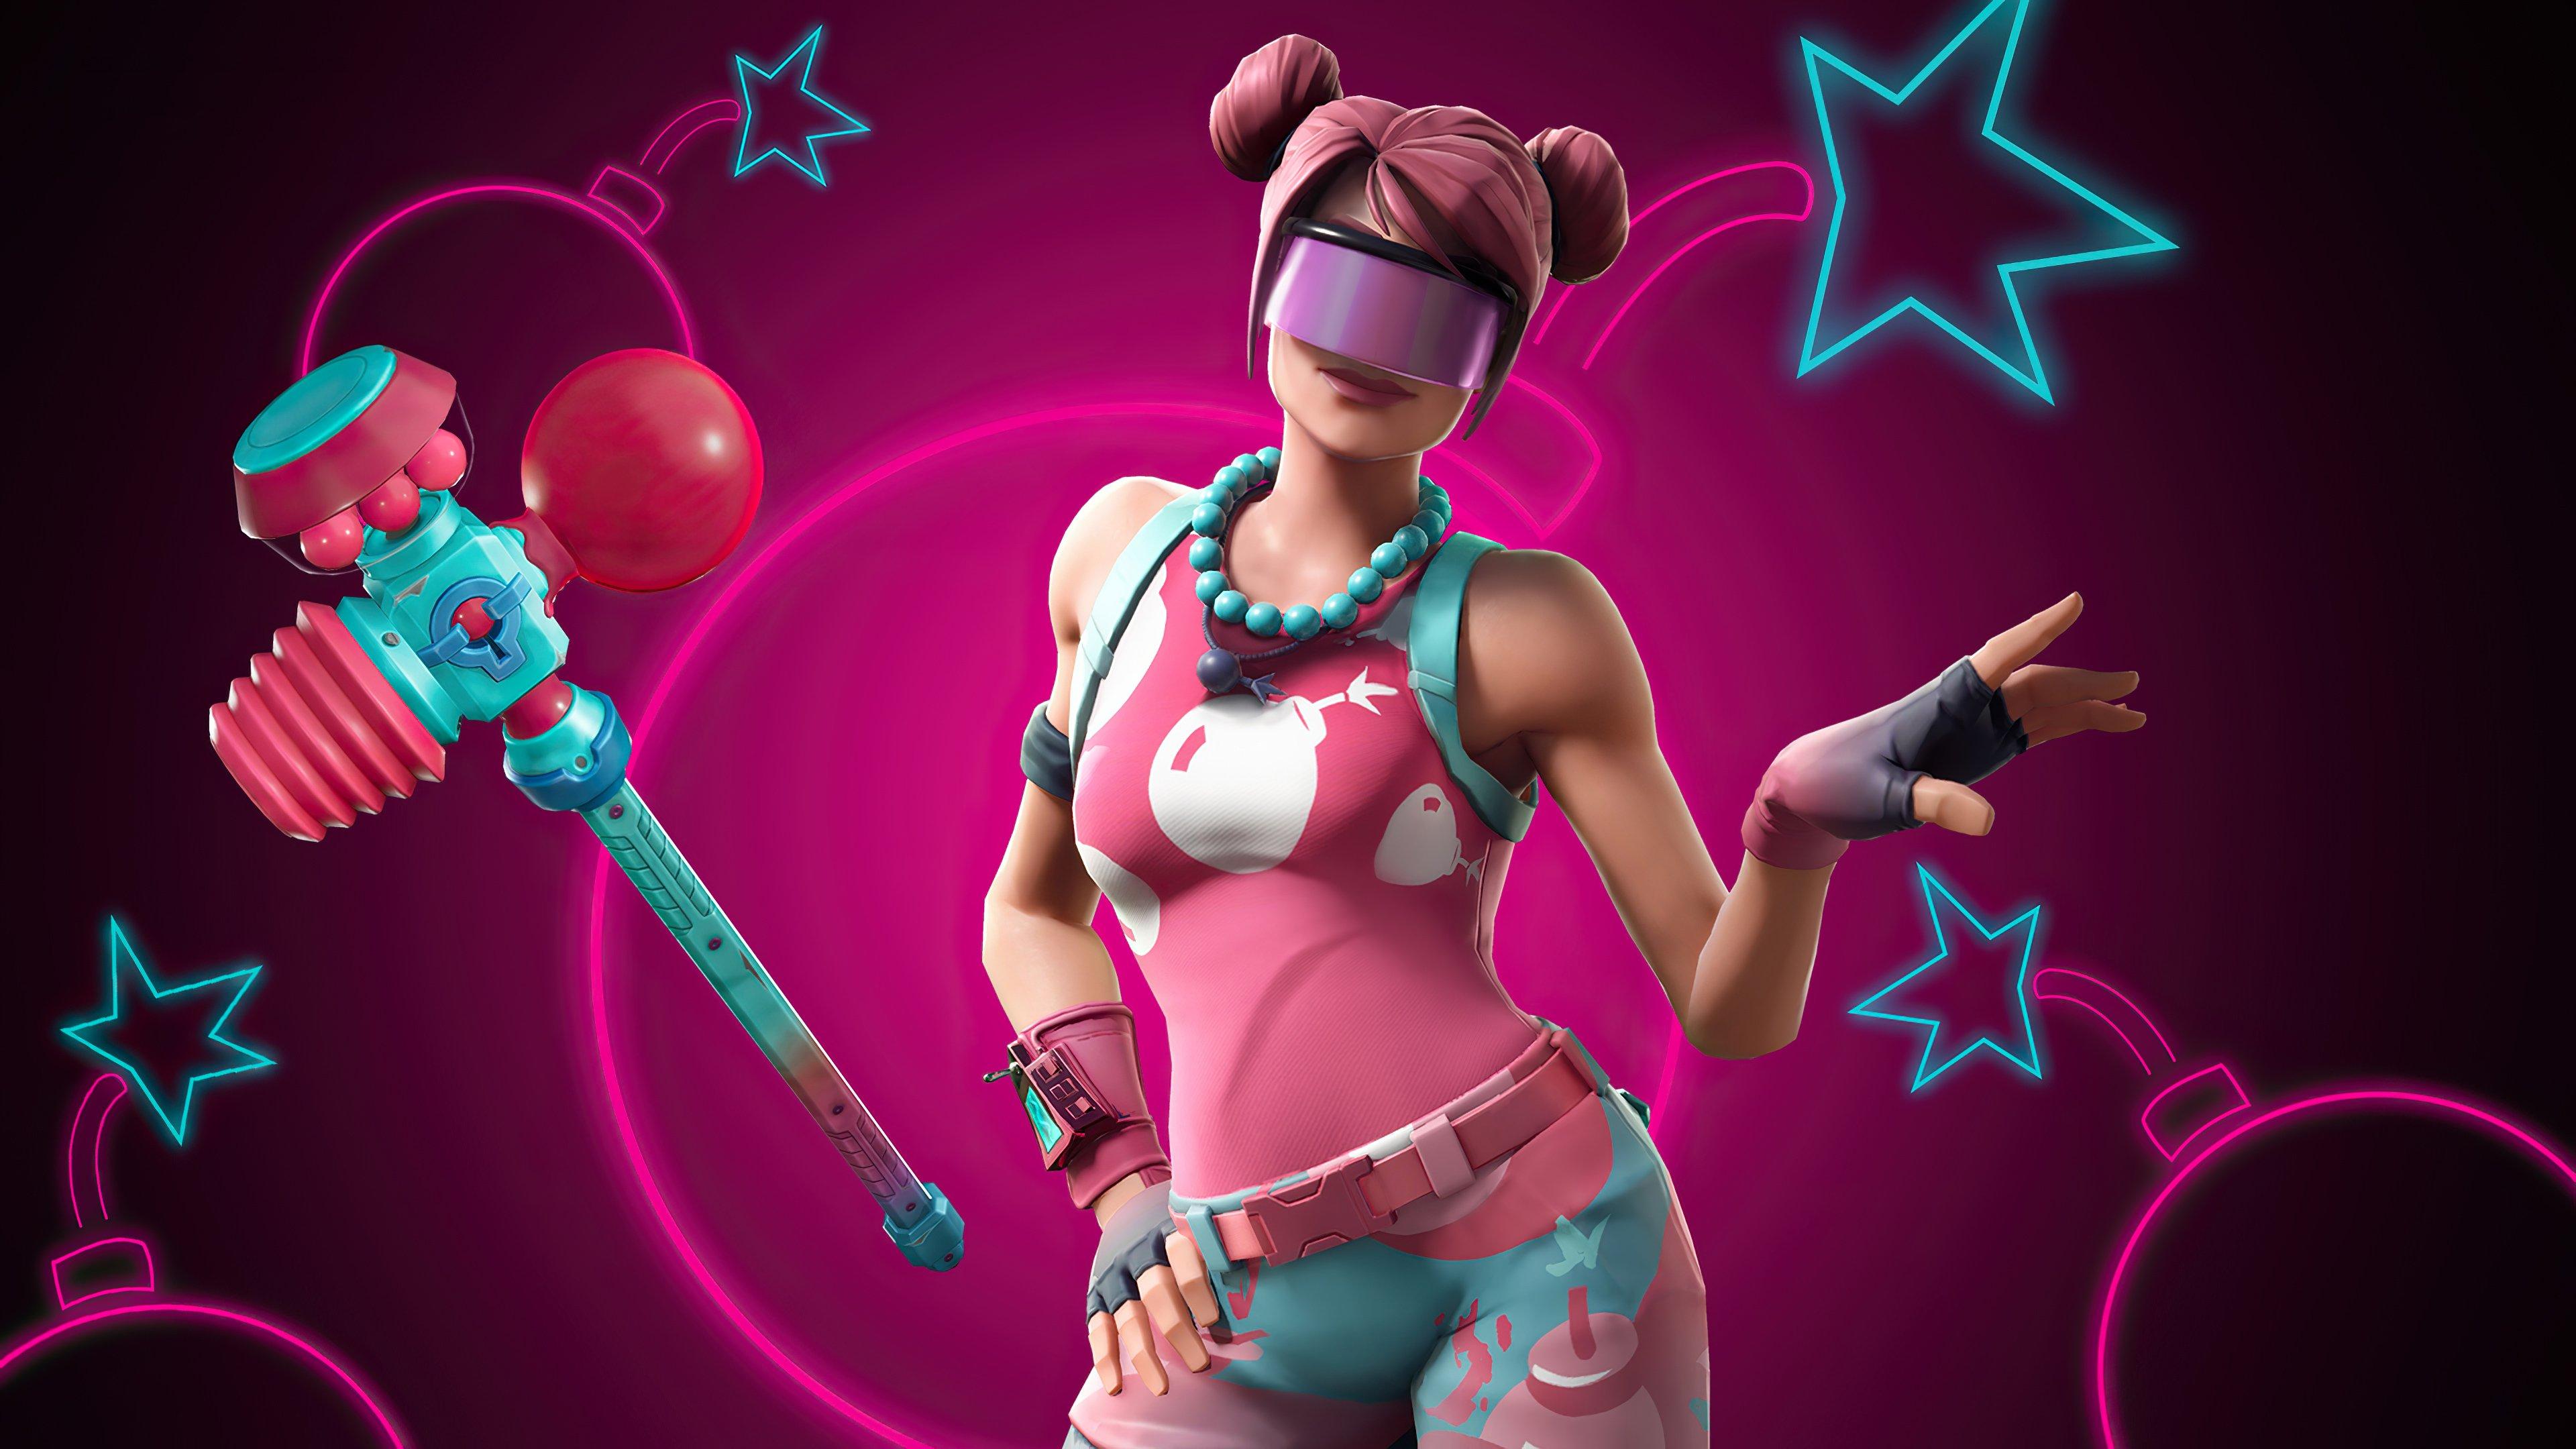 Fondos de pantalla Fortnite Candy Commando Bubble bomber outfit